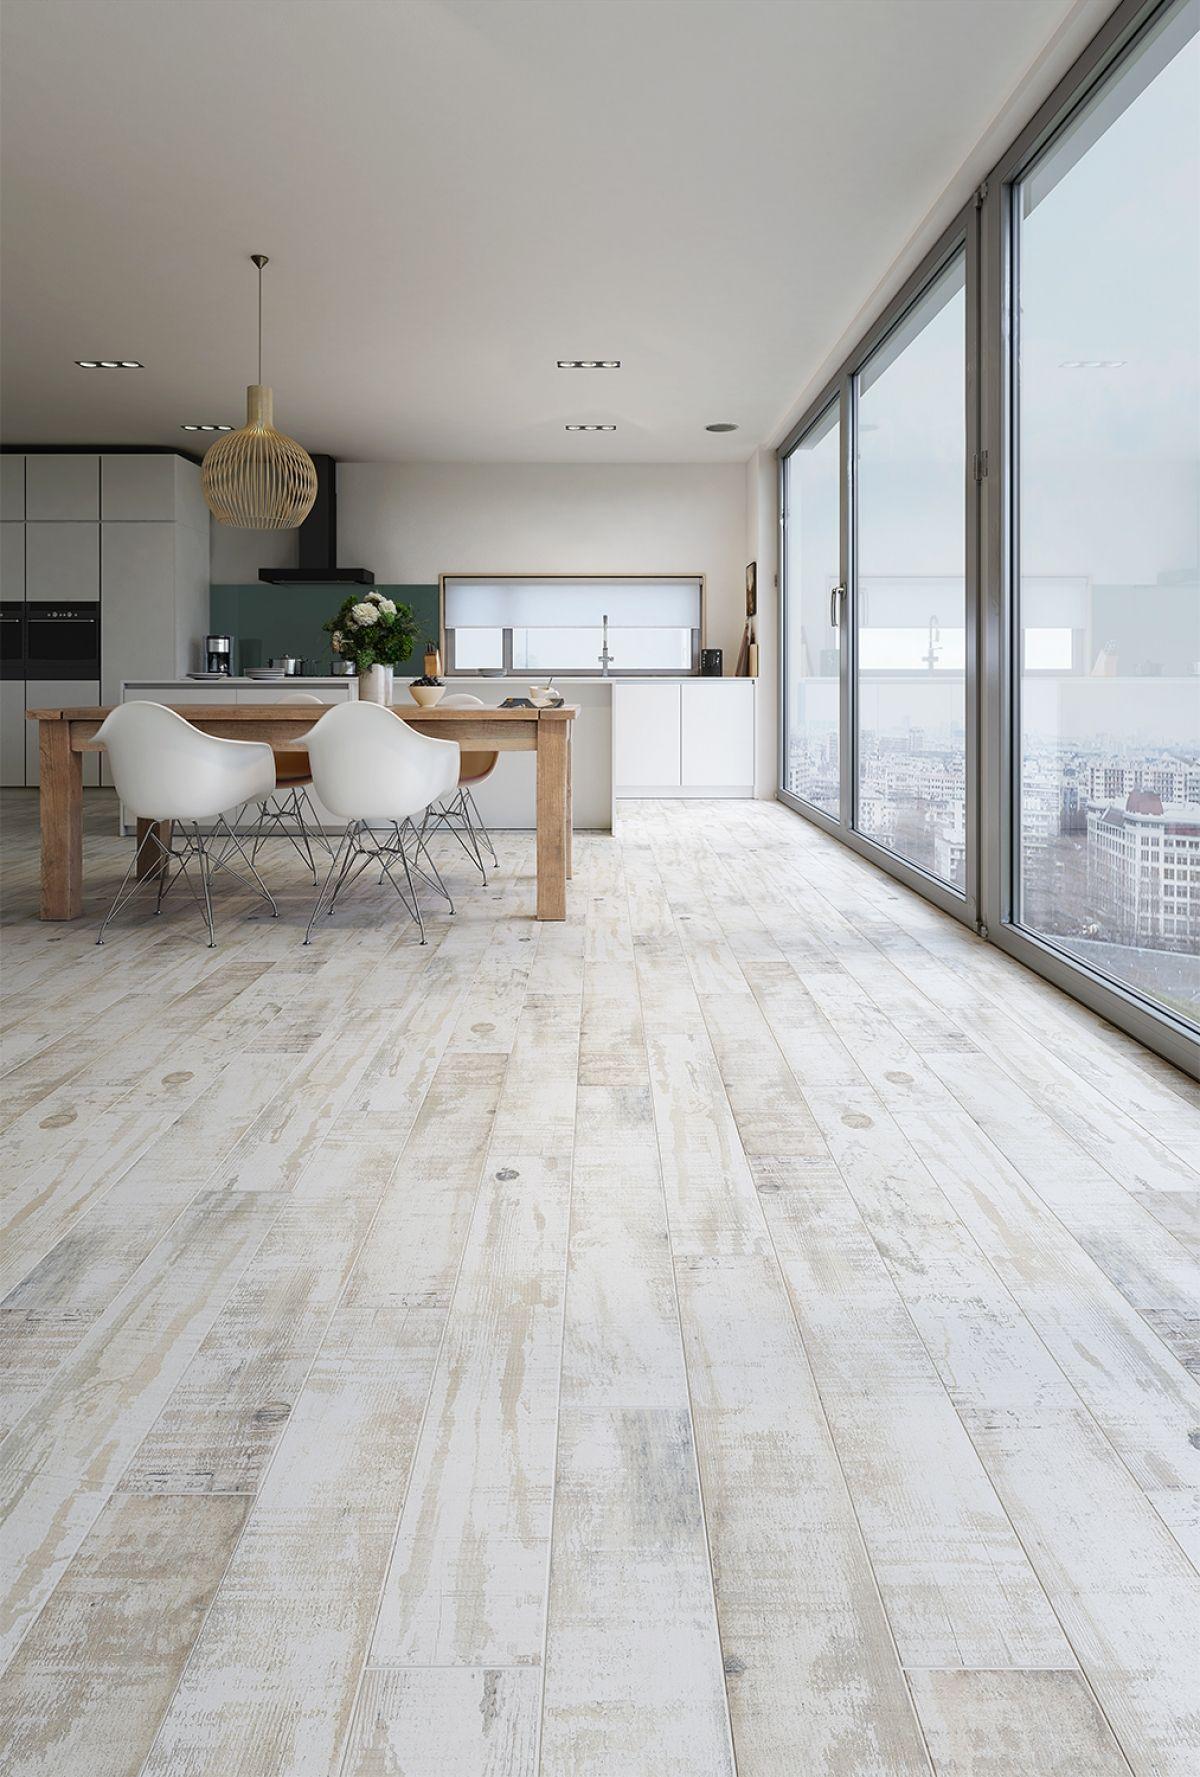 Yurtbay Seramik Kuche Holz Rustikale Boden Haus Bodenbelag Und